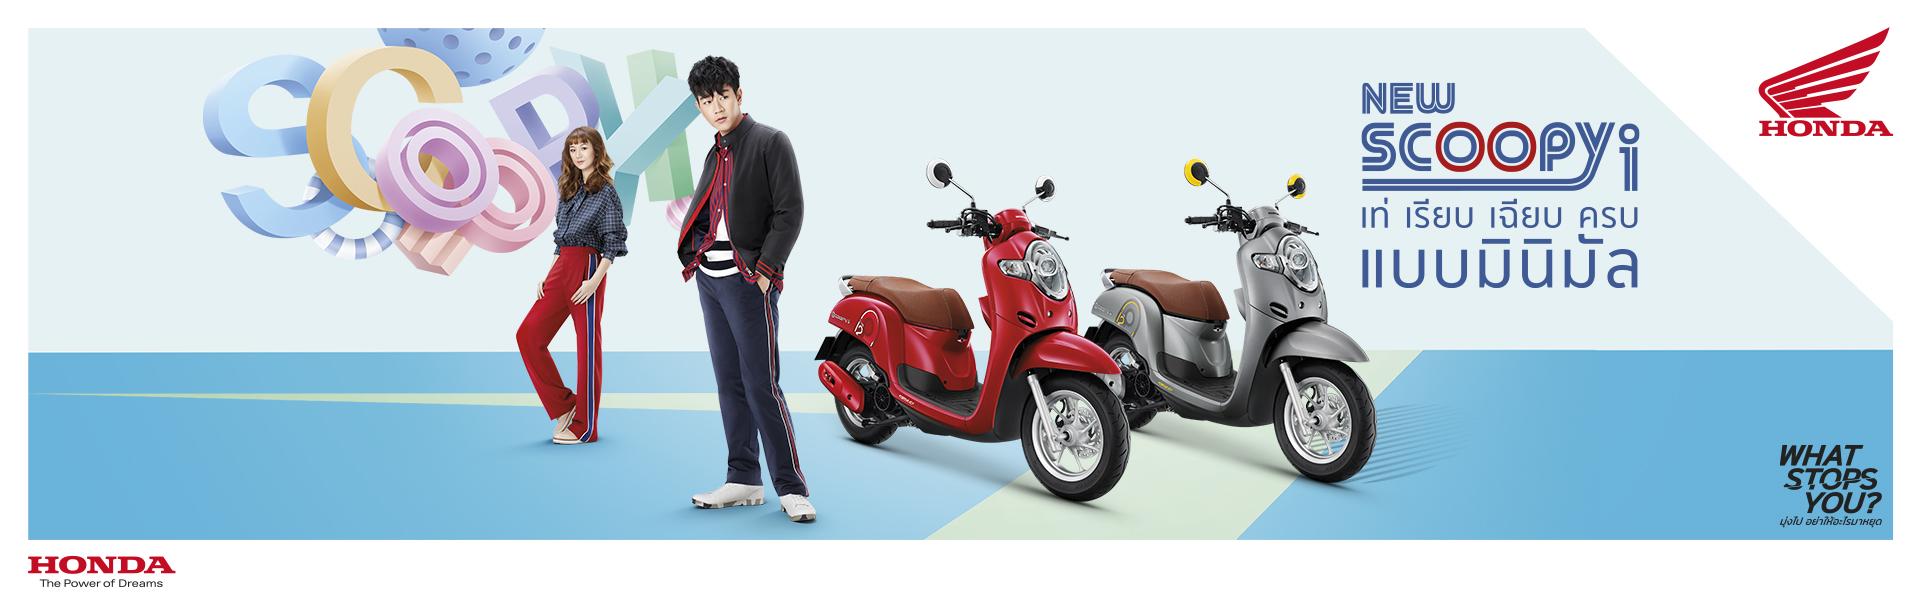 Honda-Motorcycle-มอเตอร์ไซค์-ฮอนด้า-scoopy-i-2018